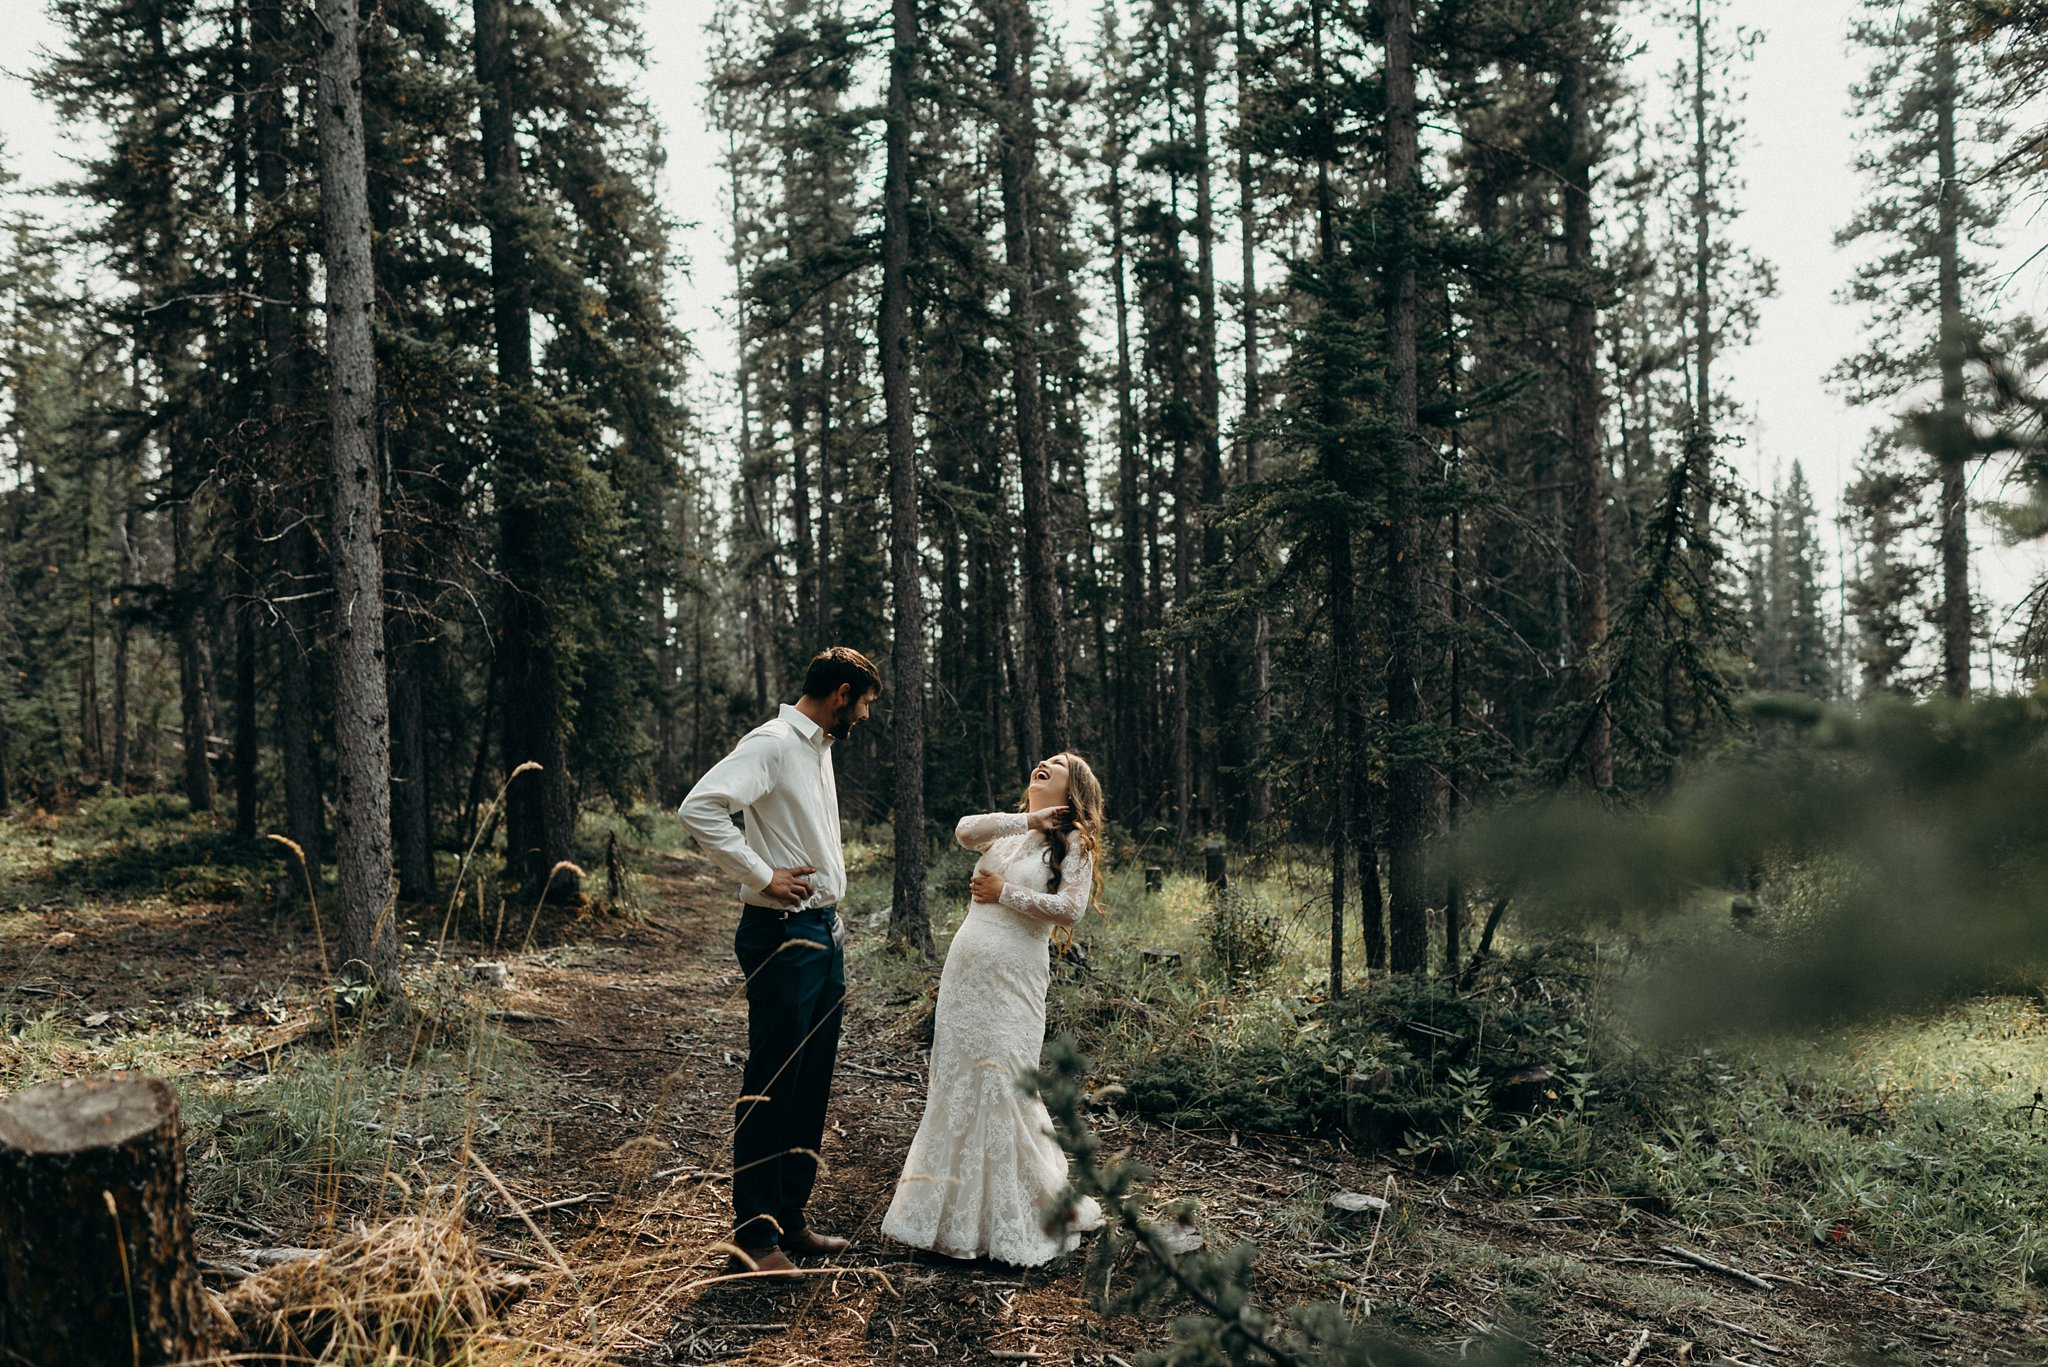 kaihla_tonai_intimate_wedding_elopement_photographer_6713.jpg